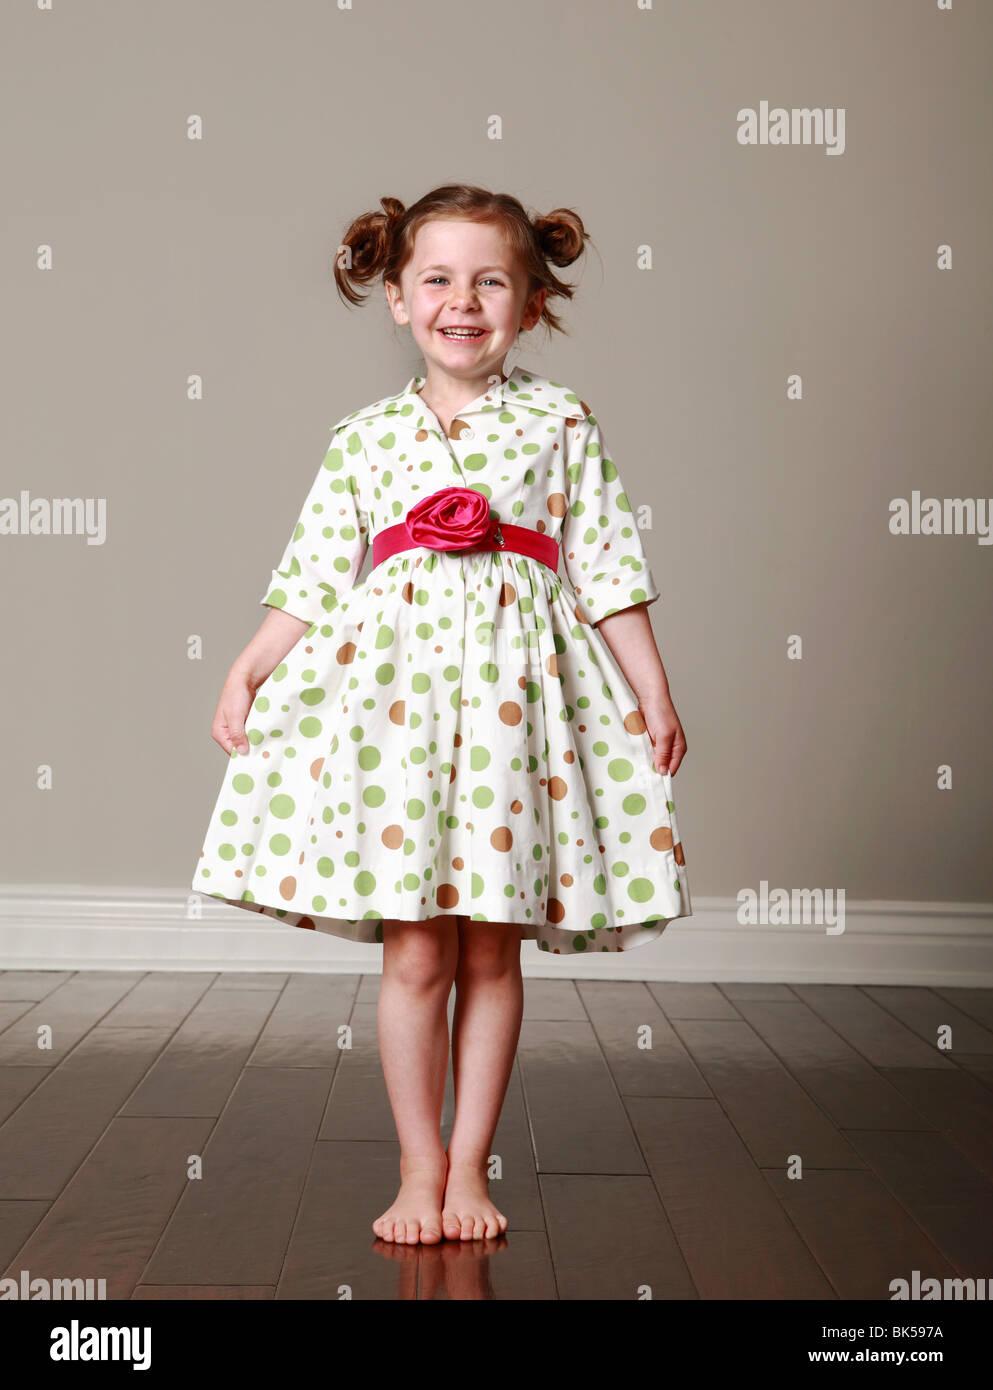 Girl showing off polka dot dress - Stock Image